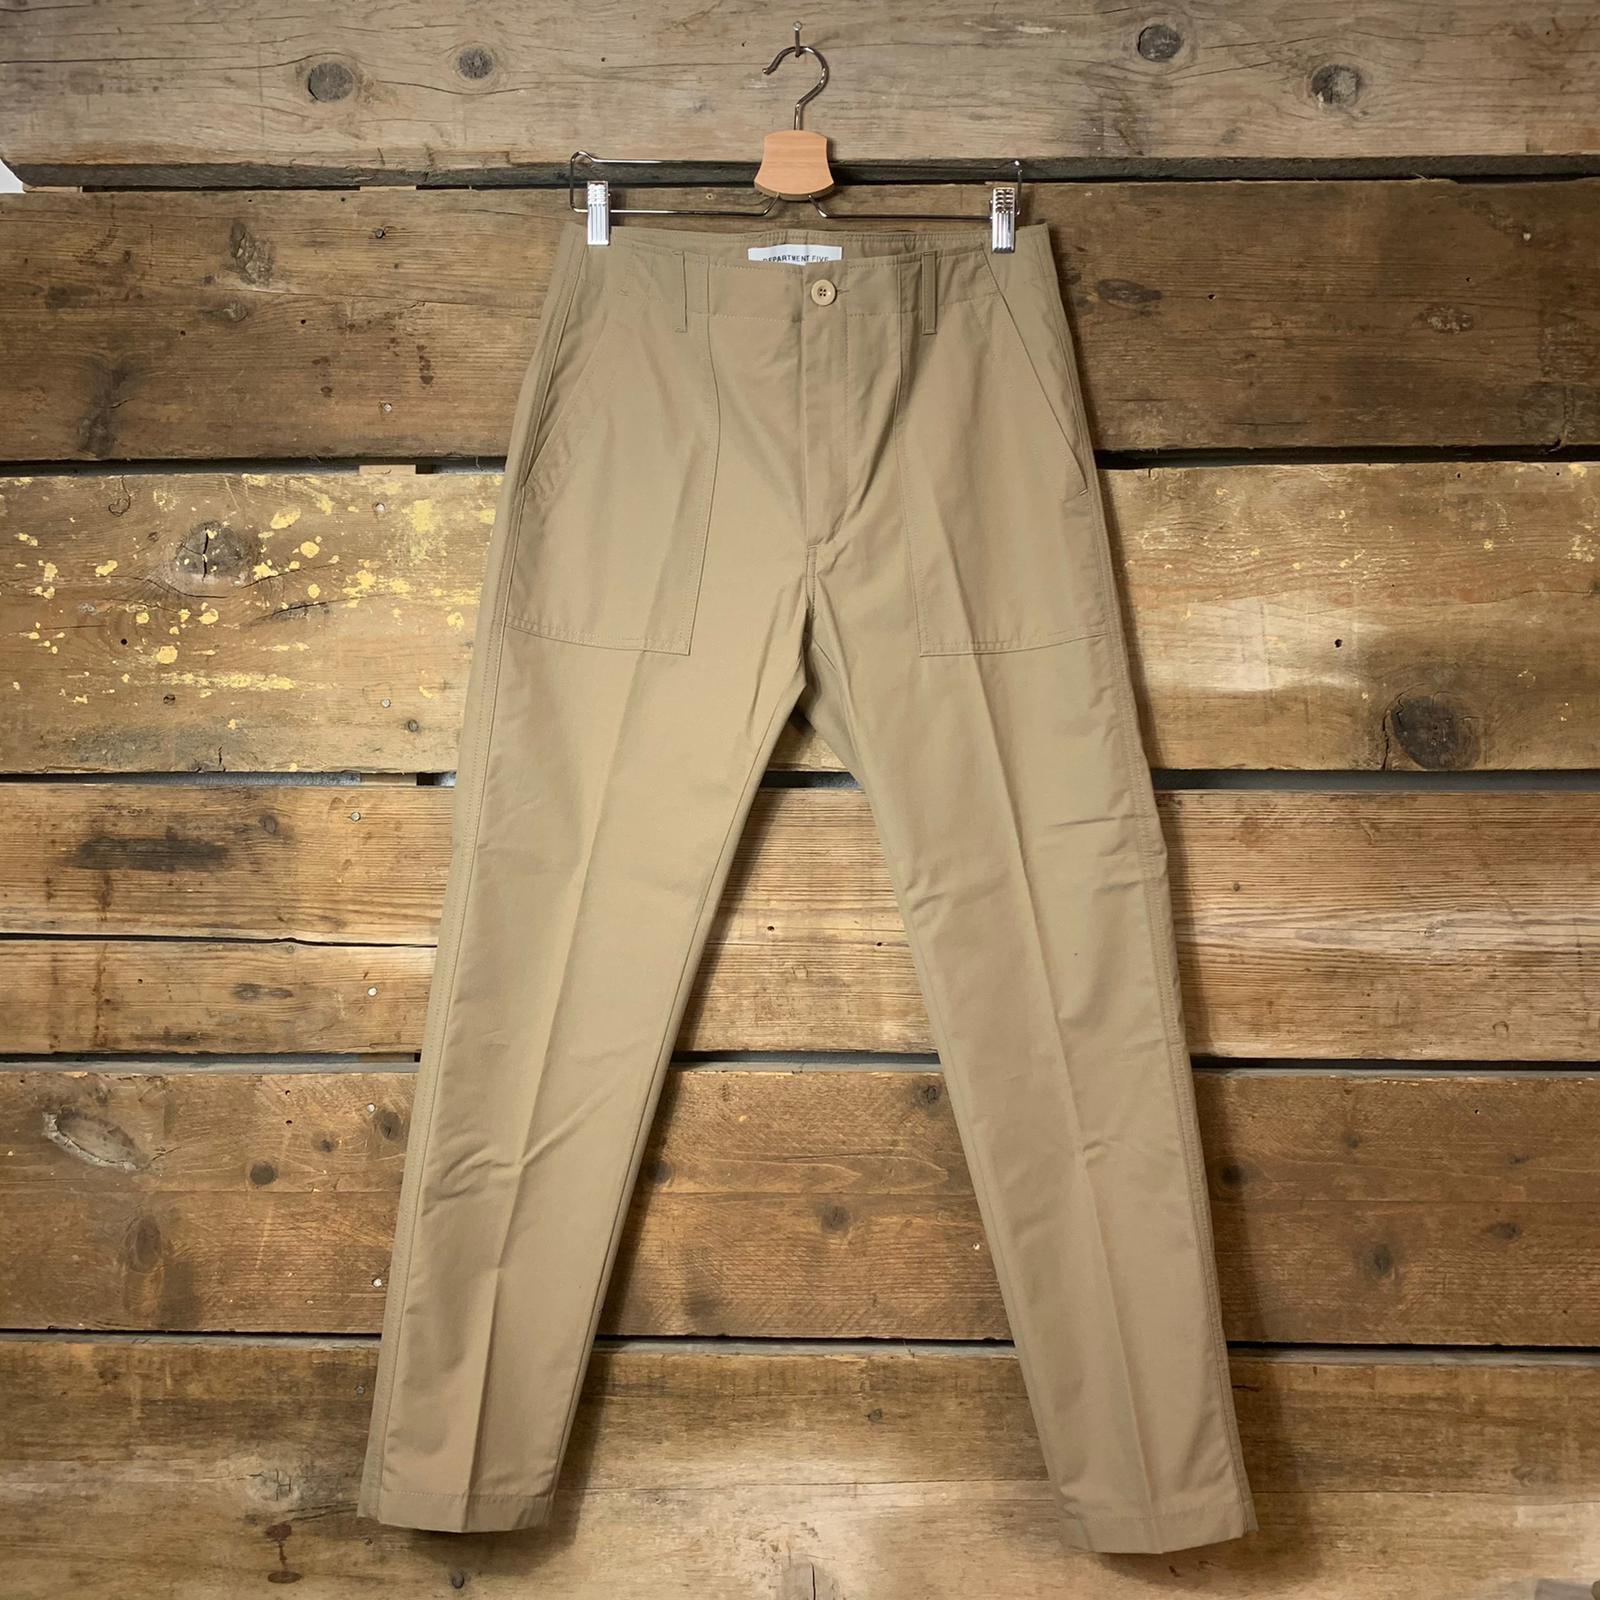 Pantalone Department 5 Uomo Prince Fatique Corda